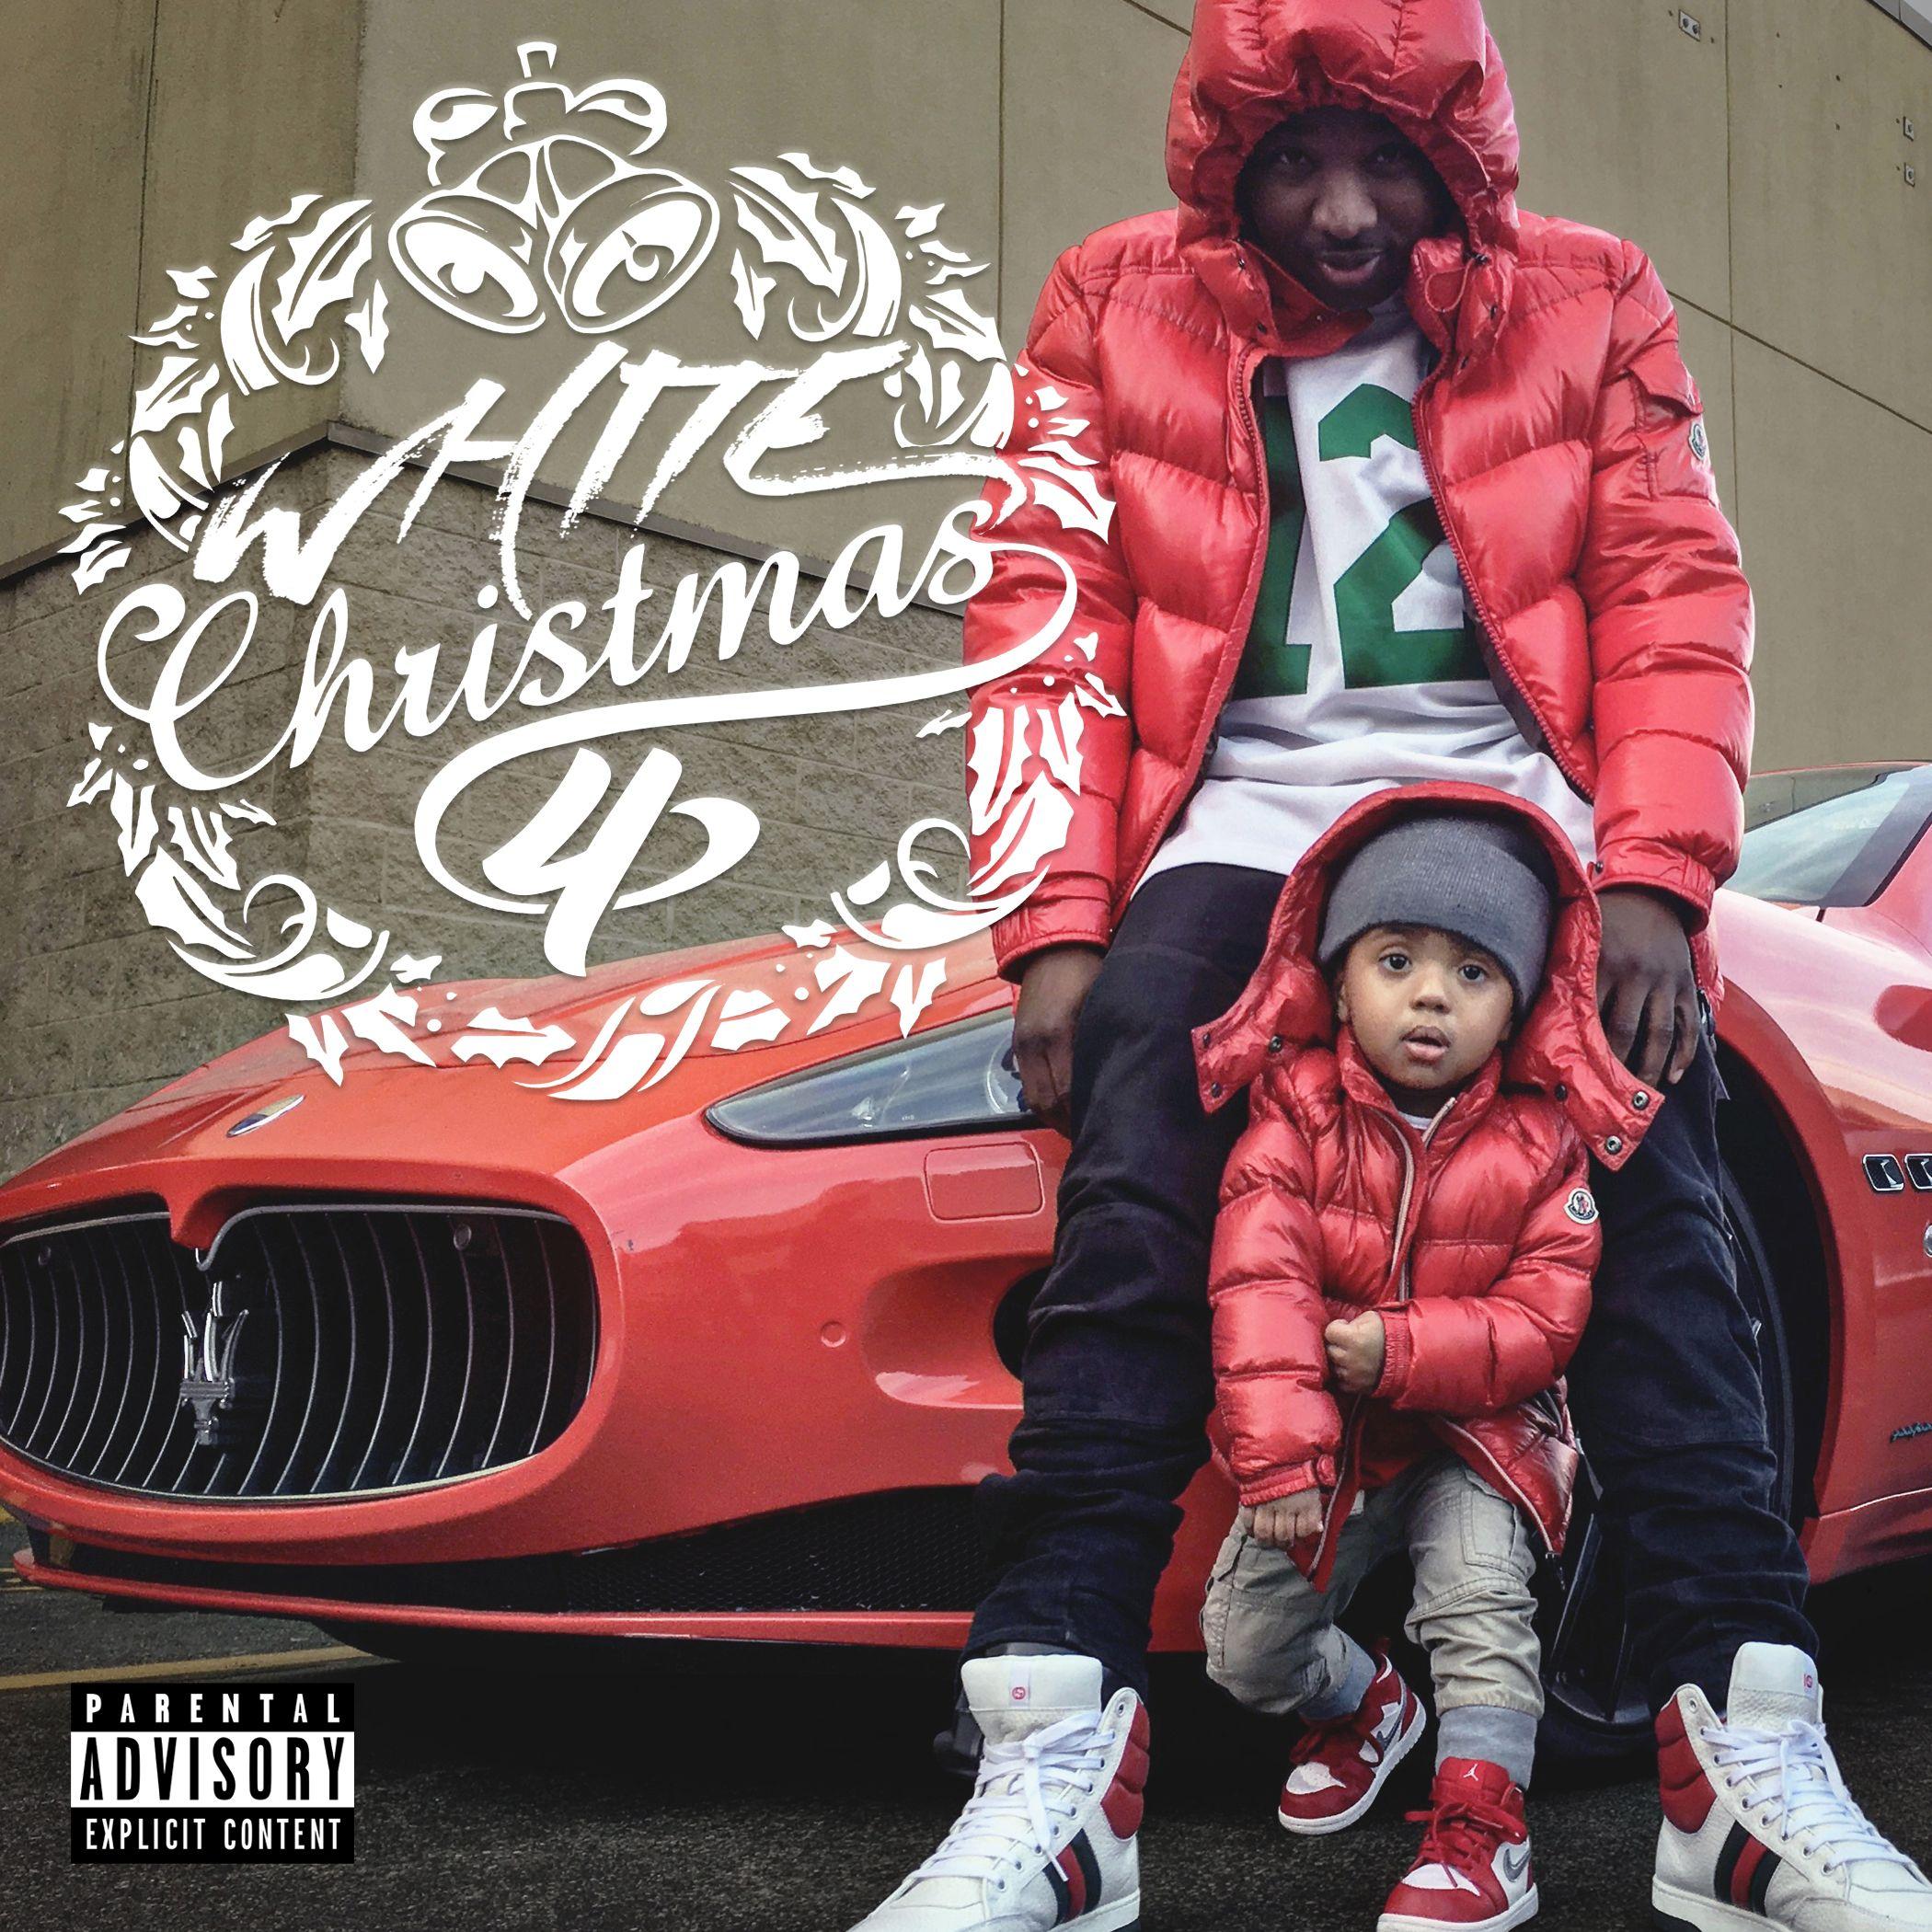 troy-ave-white-christmas-4-mixtape